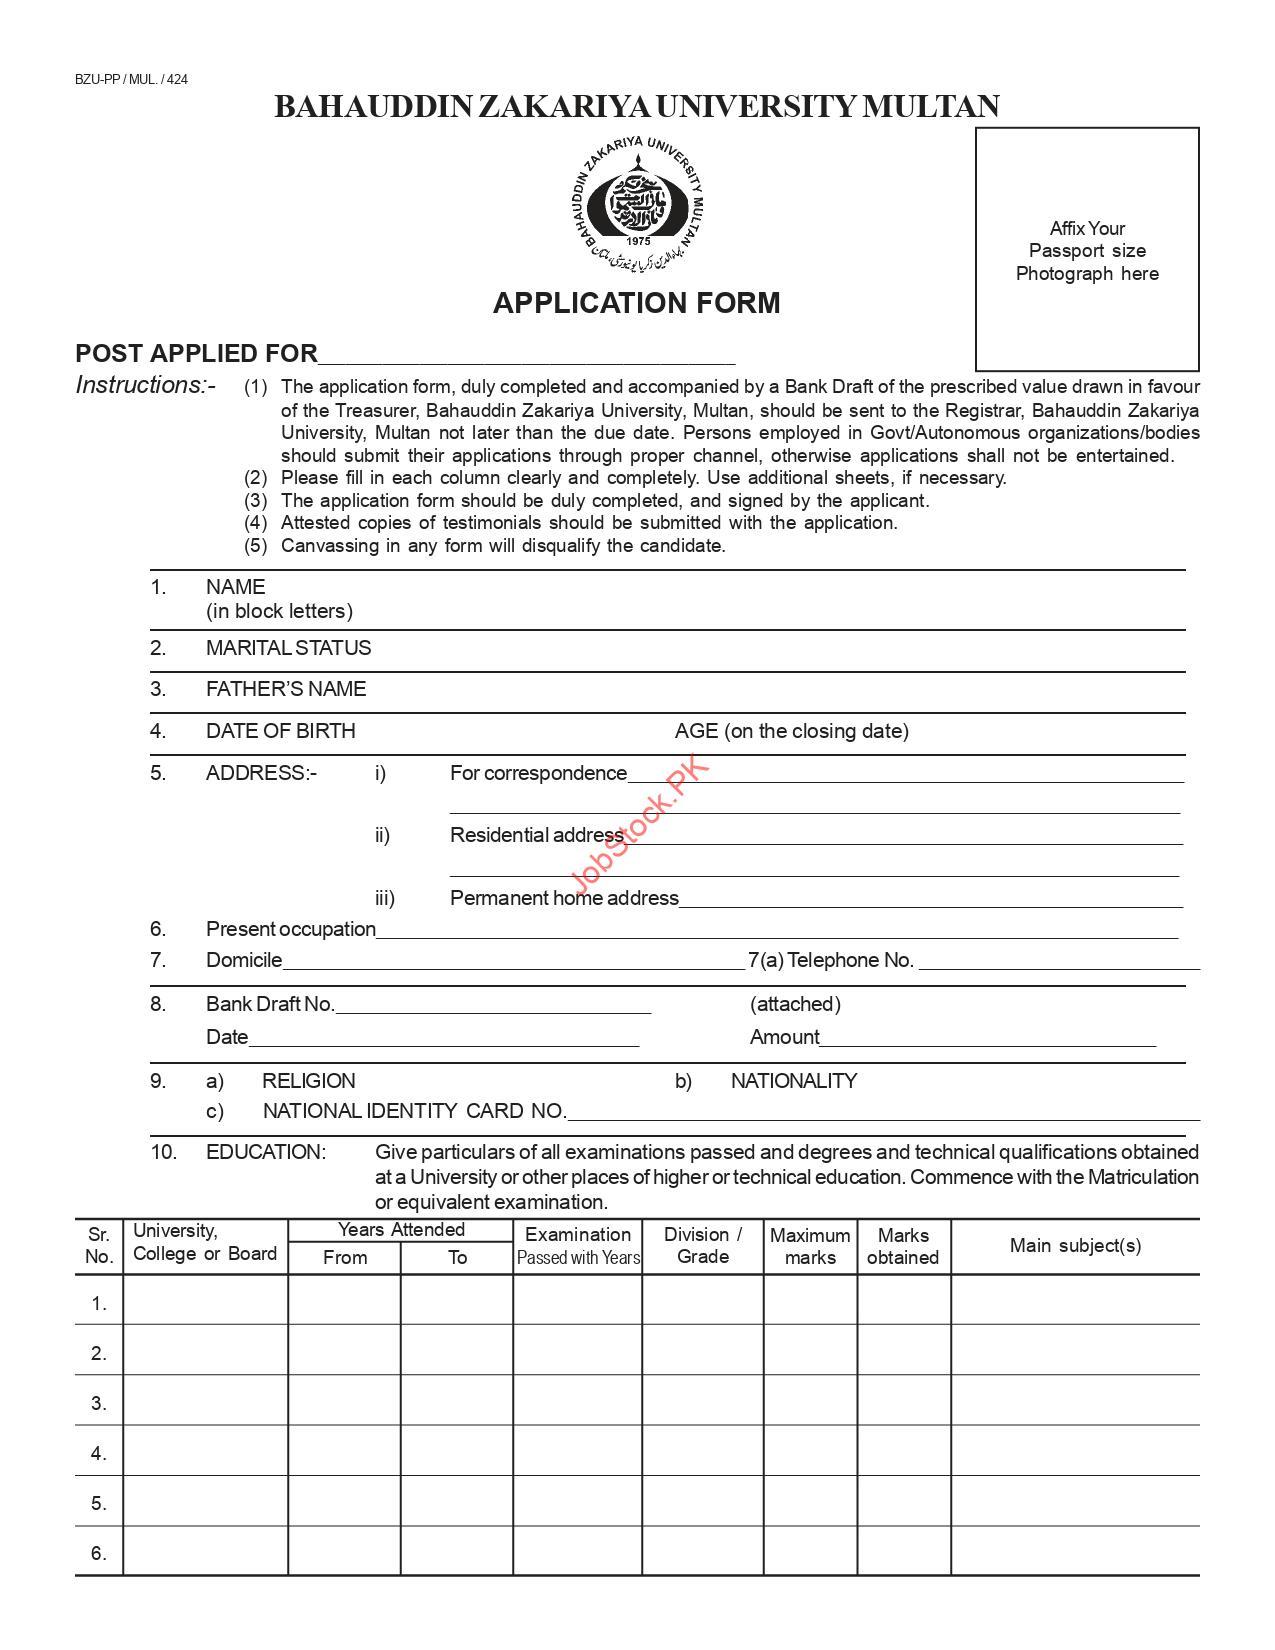 Bzu Jobs Application Form Page 1